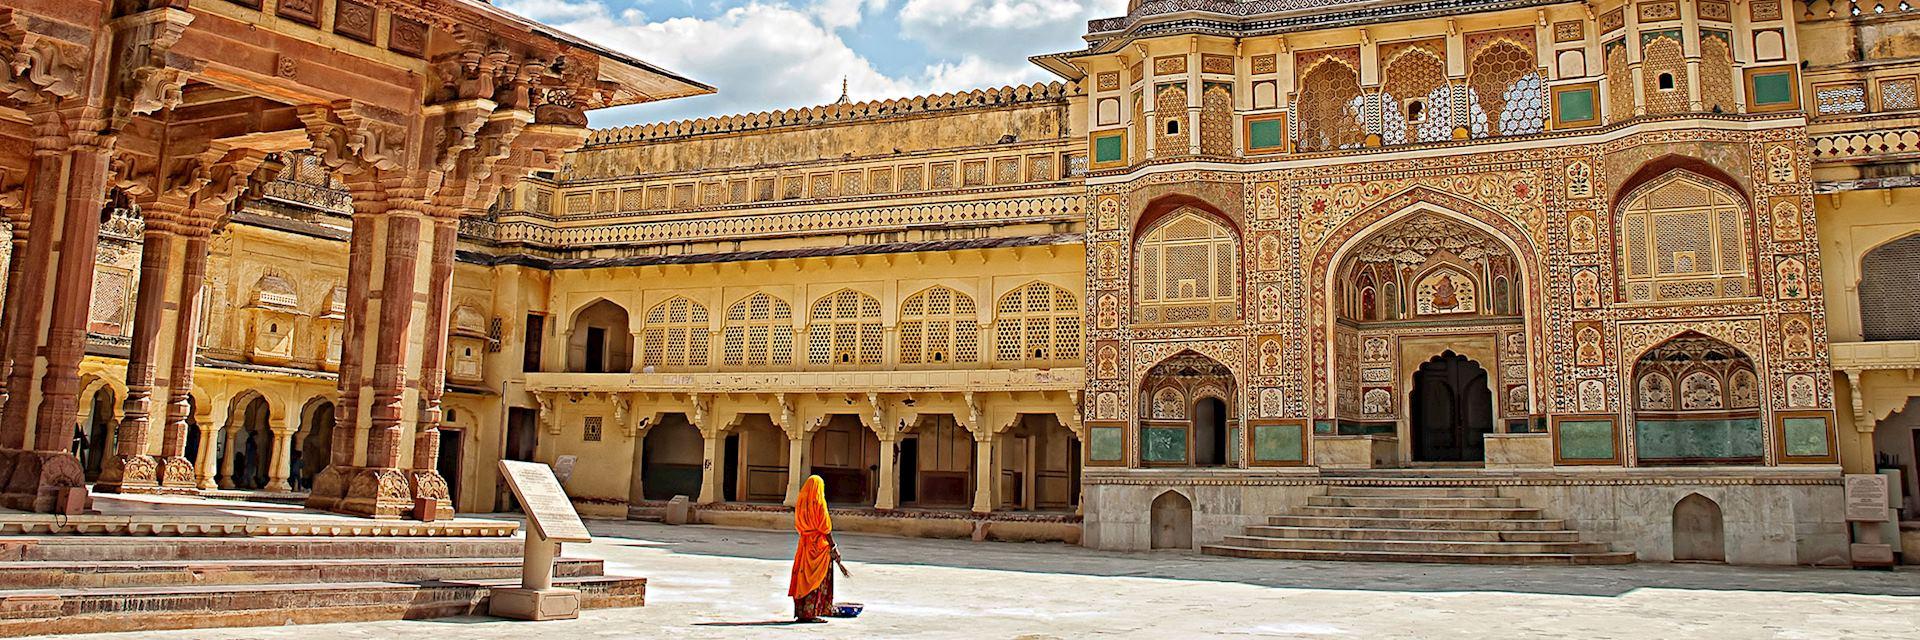 Decorated gateway, Amber Fort, Jaipur